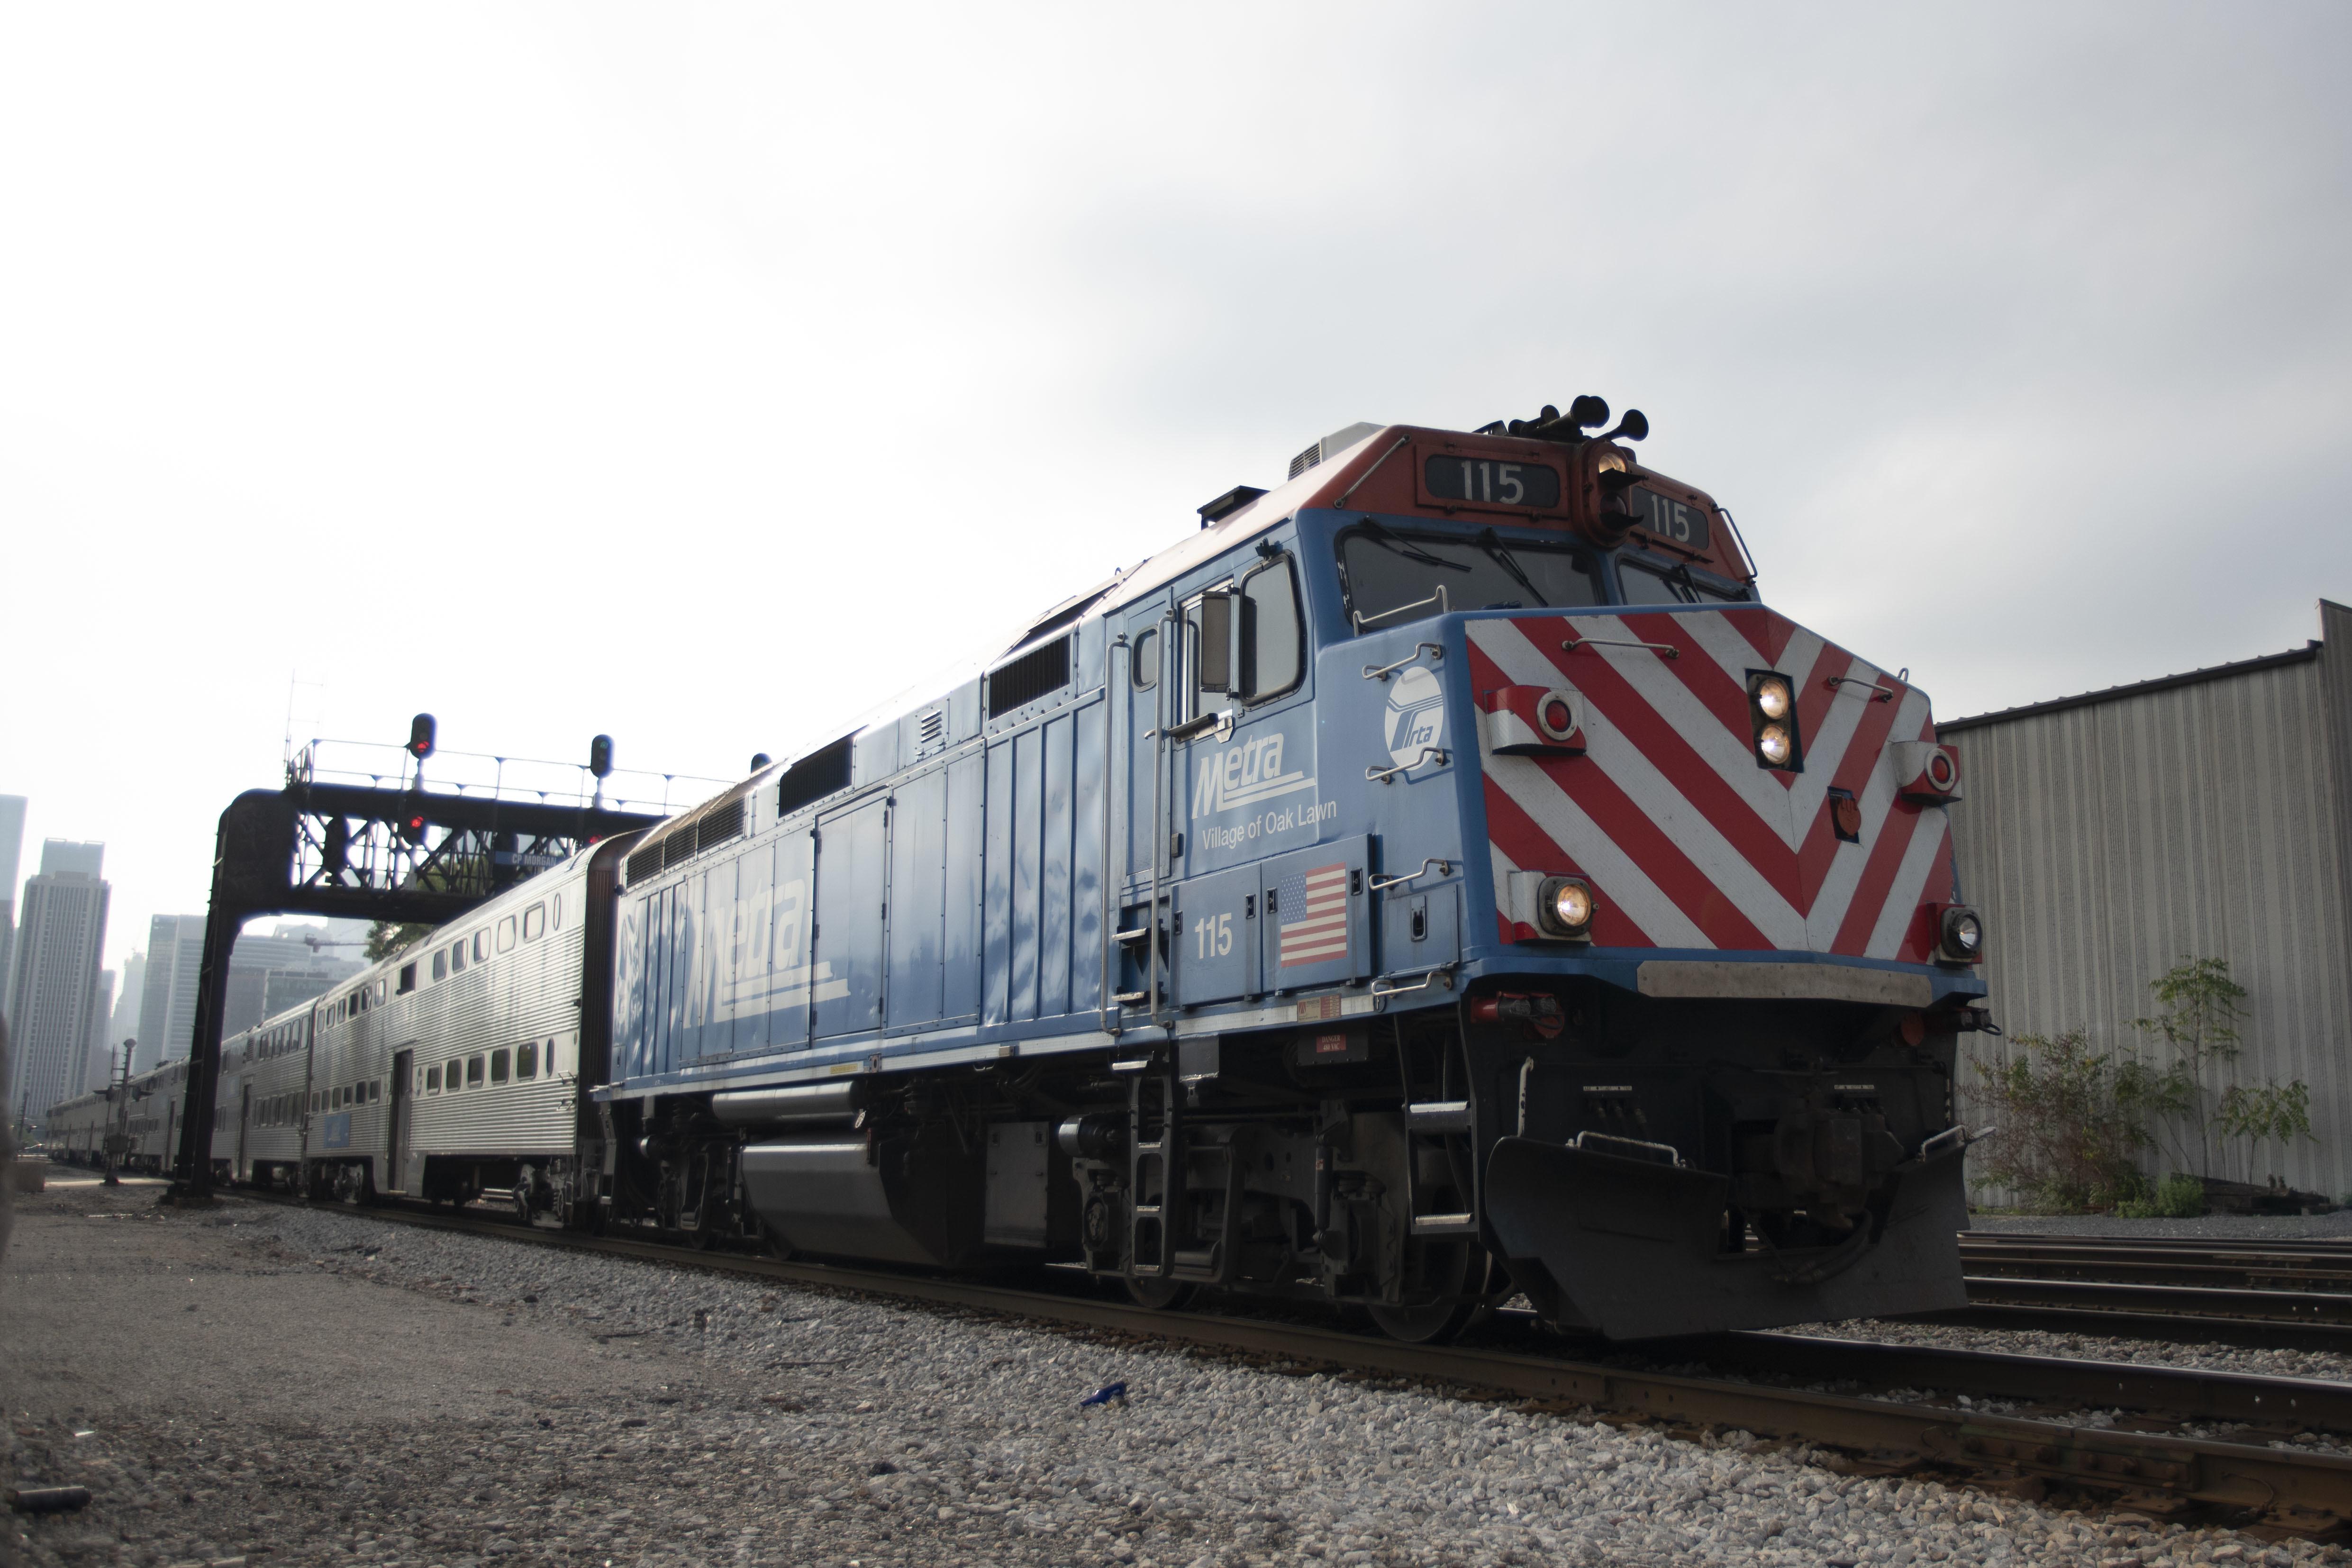 Metra BNSF service delayed after train hits, kills